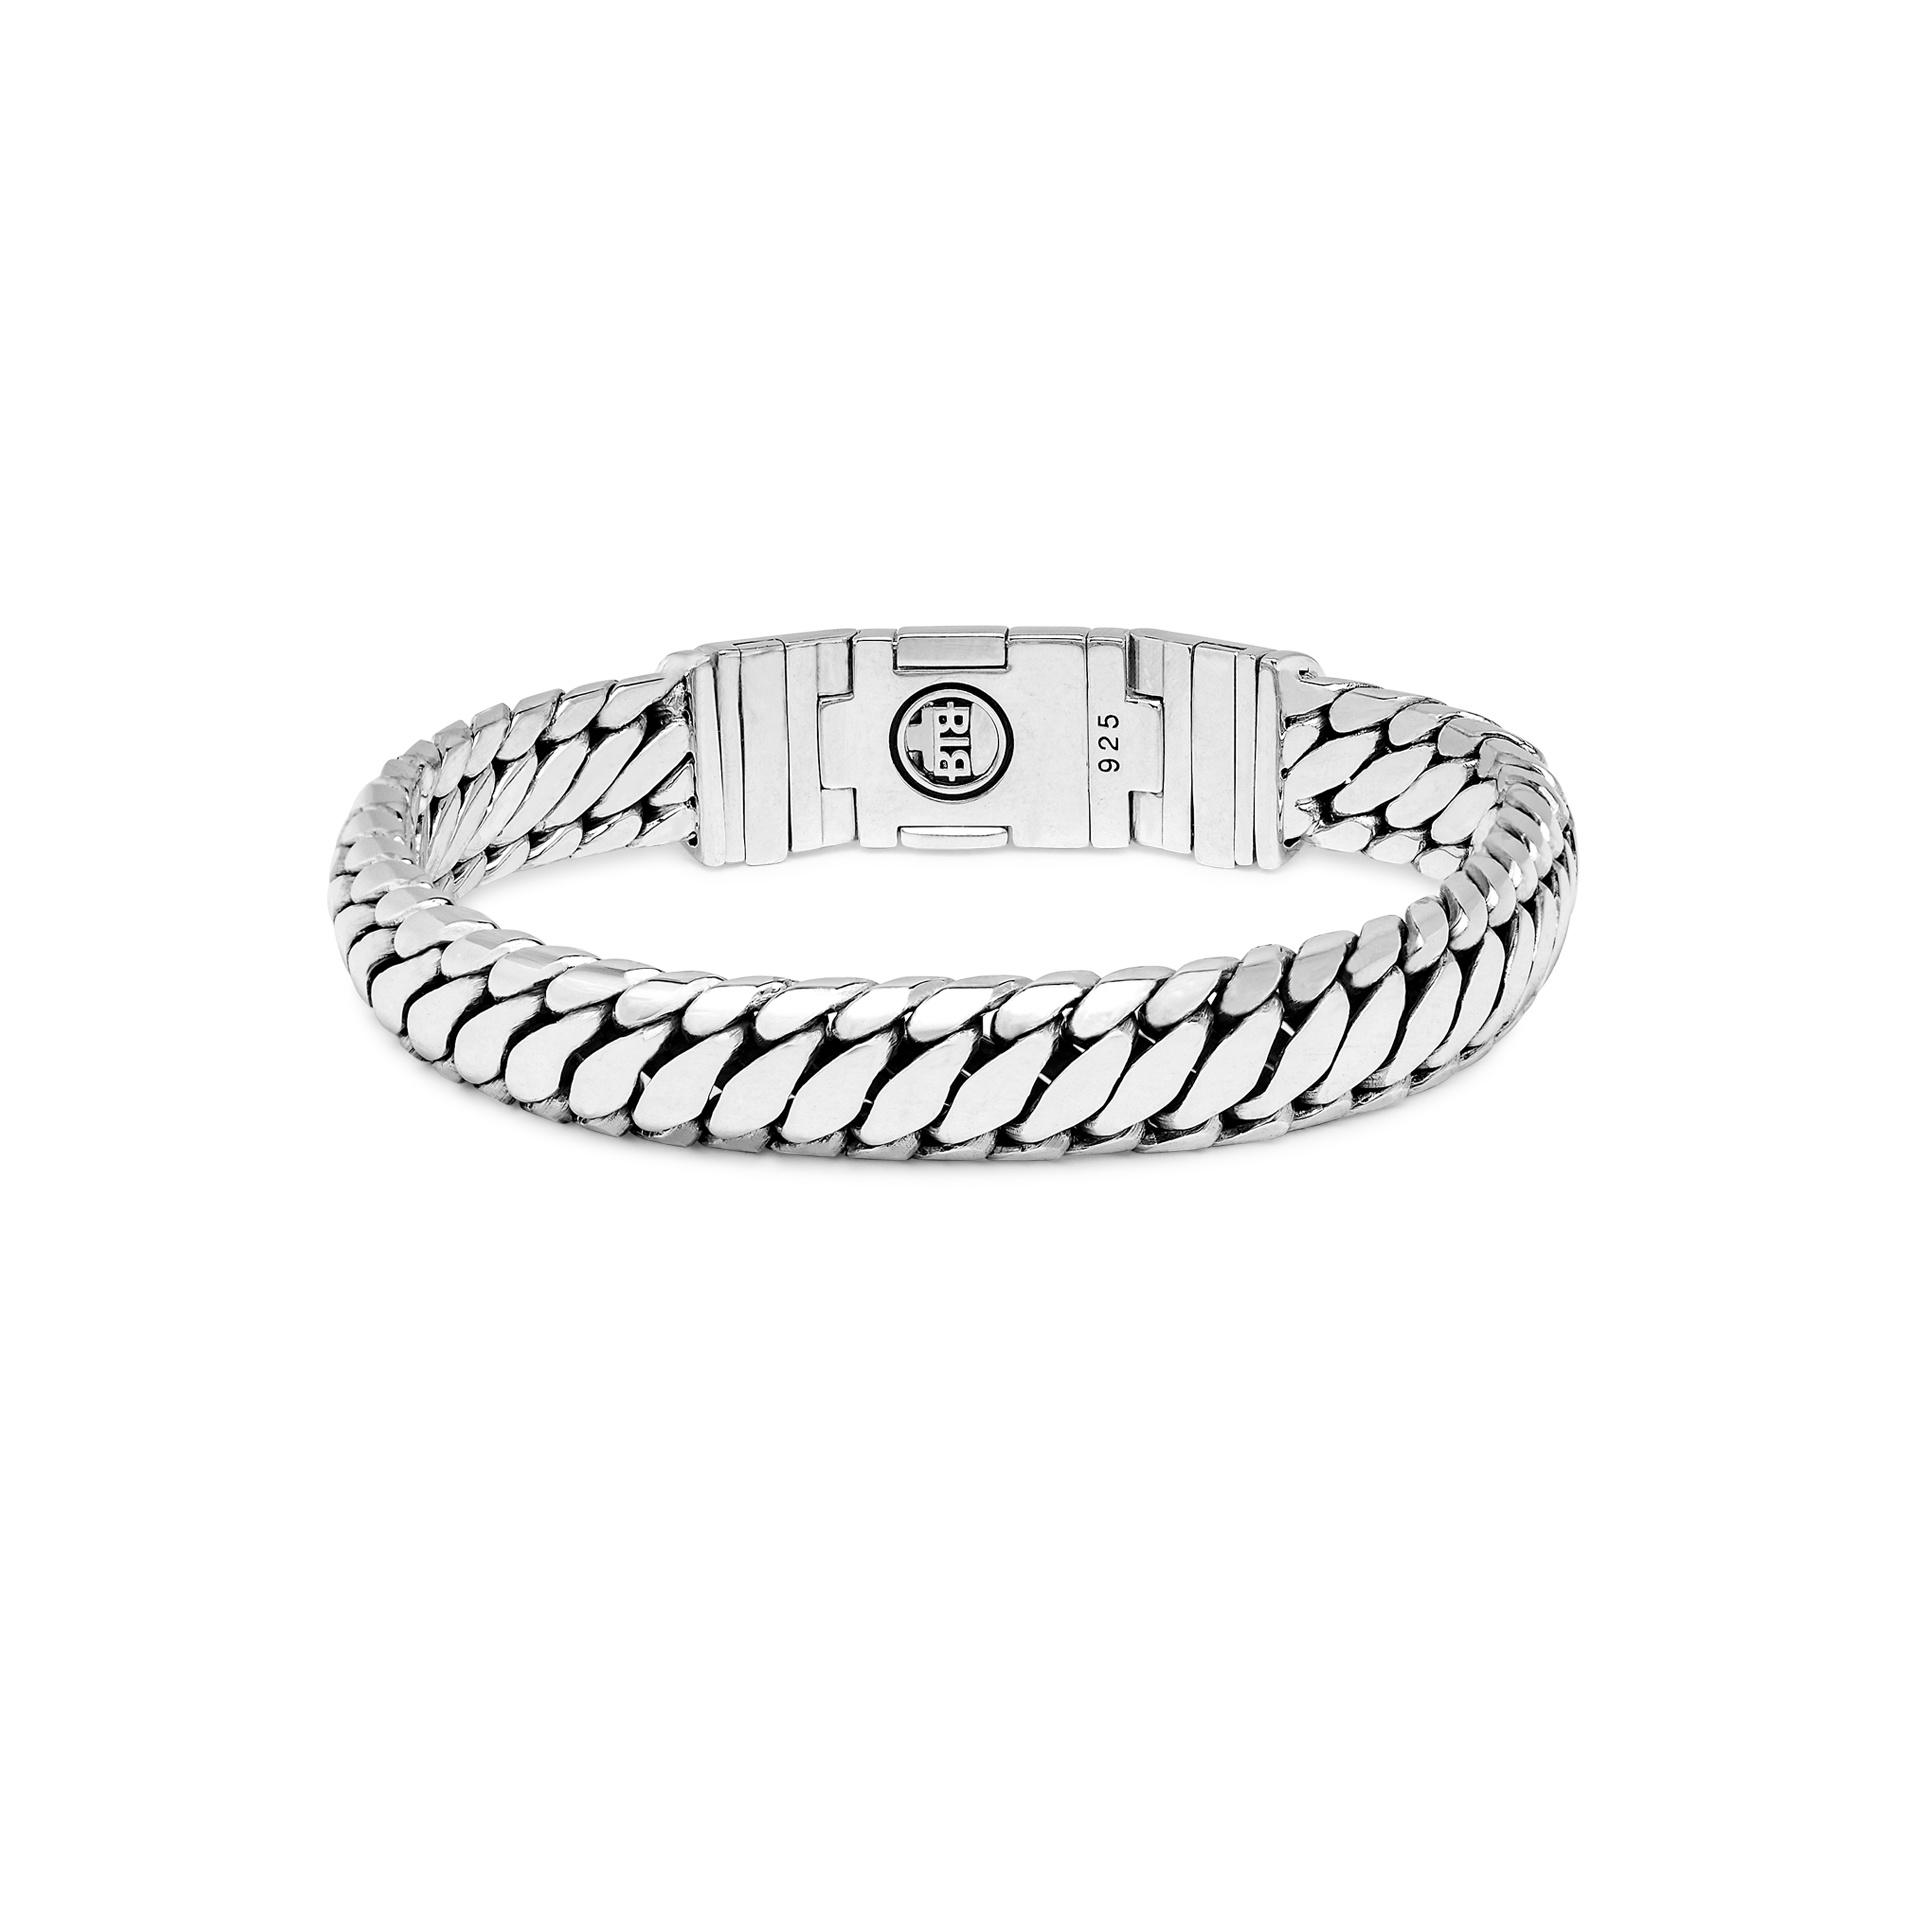 Bracelet Ben Customized Set Silver & Leather-6